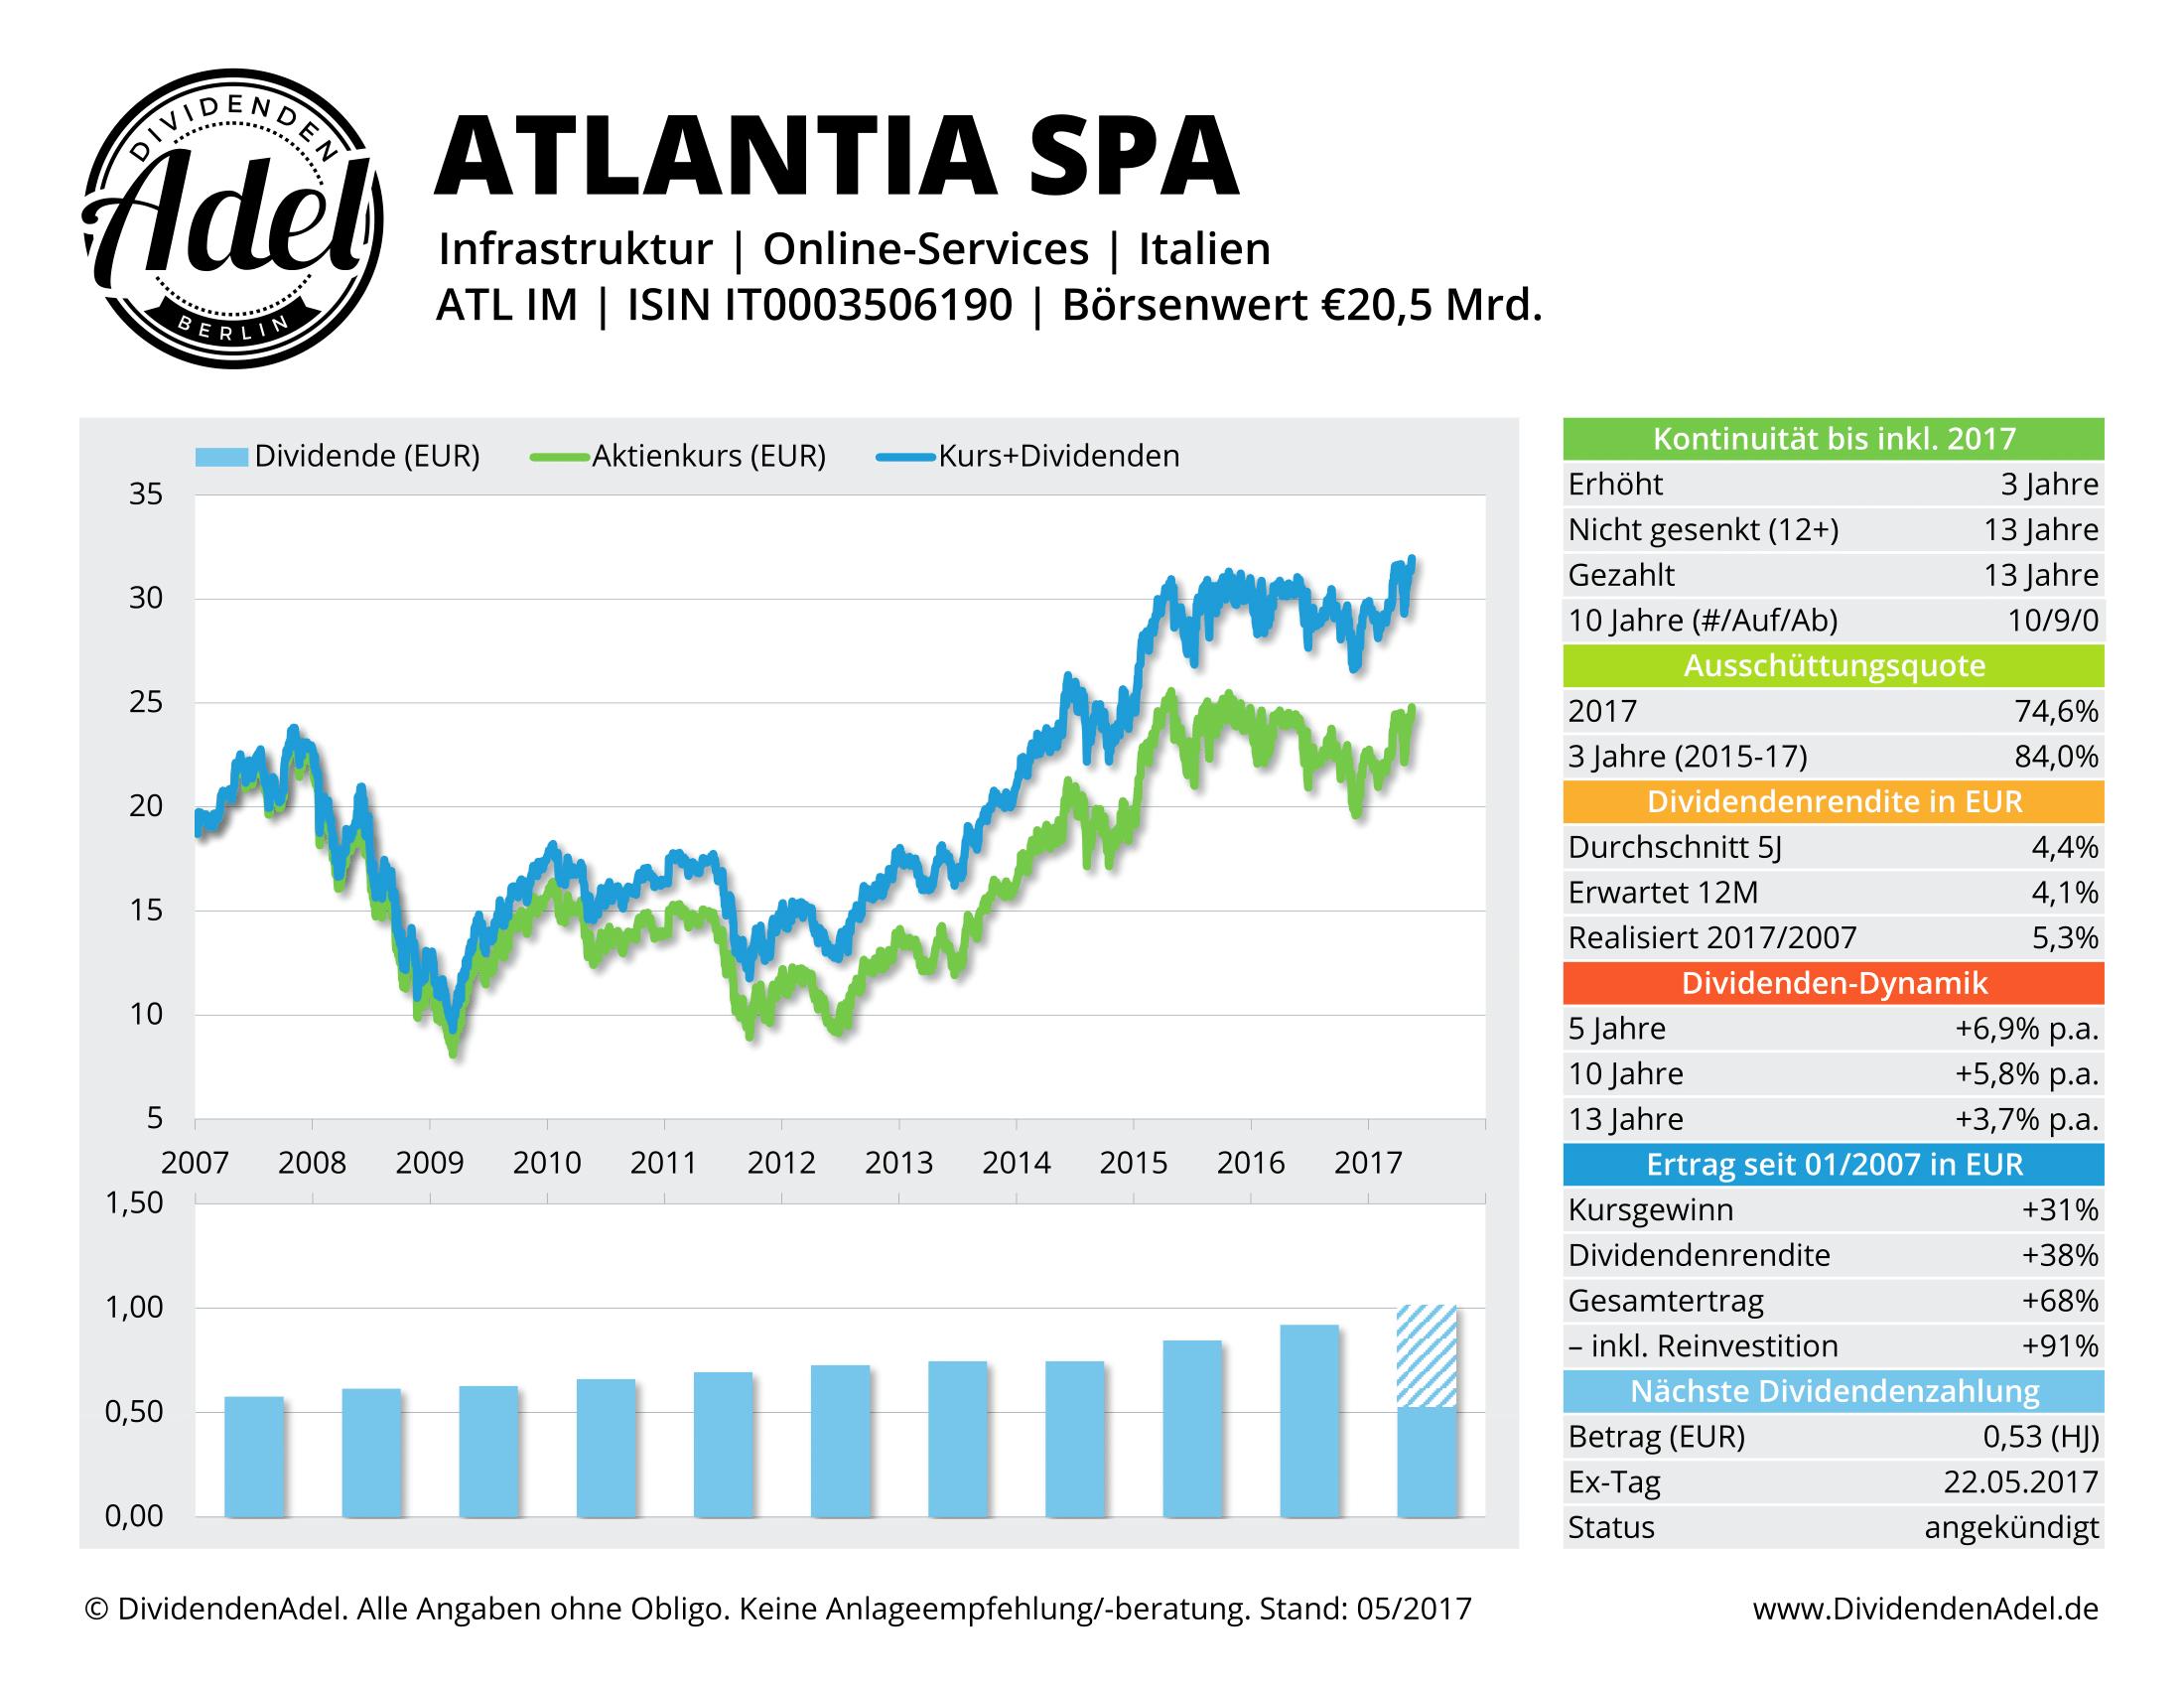 2017-05-16 ATLANTIA SPA DividendenAdel-Profil ab 2007-1